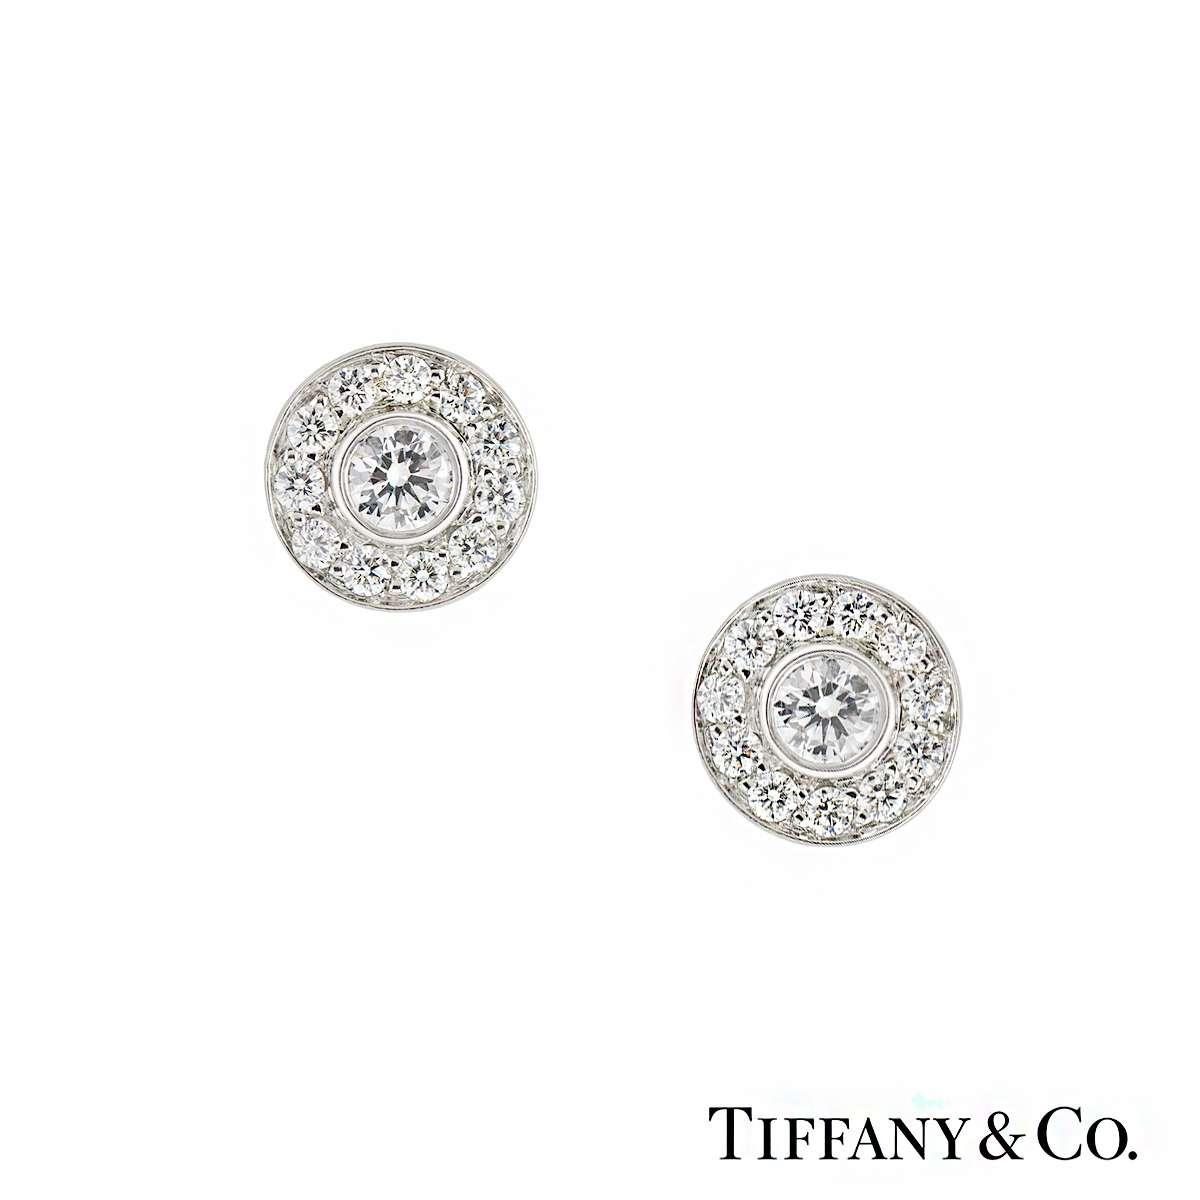 84dccfcc9 Tiffany & Co Diamond Set Circlet Earstuds in Platinum 0.53ct - Rich Diamonds  Of Bond Street